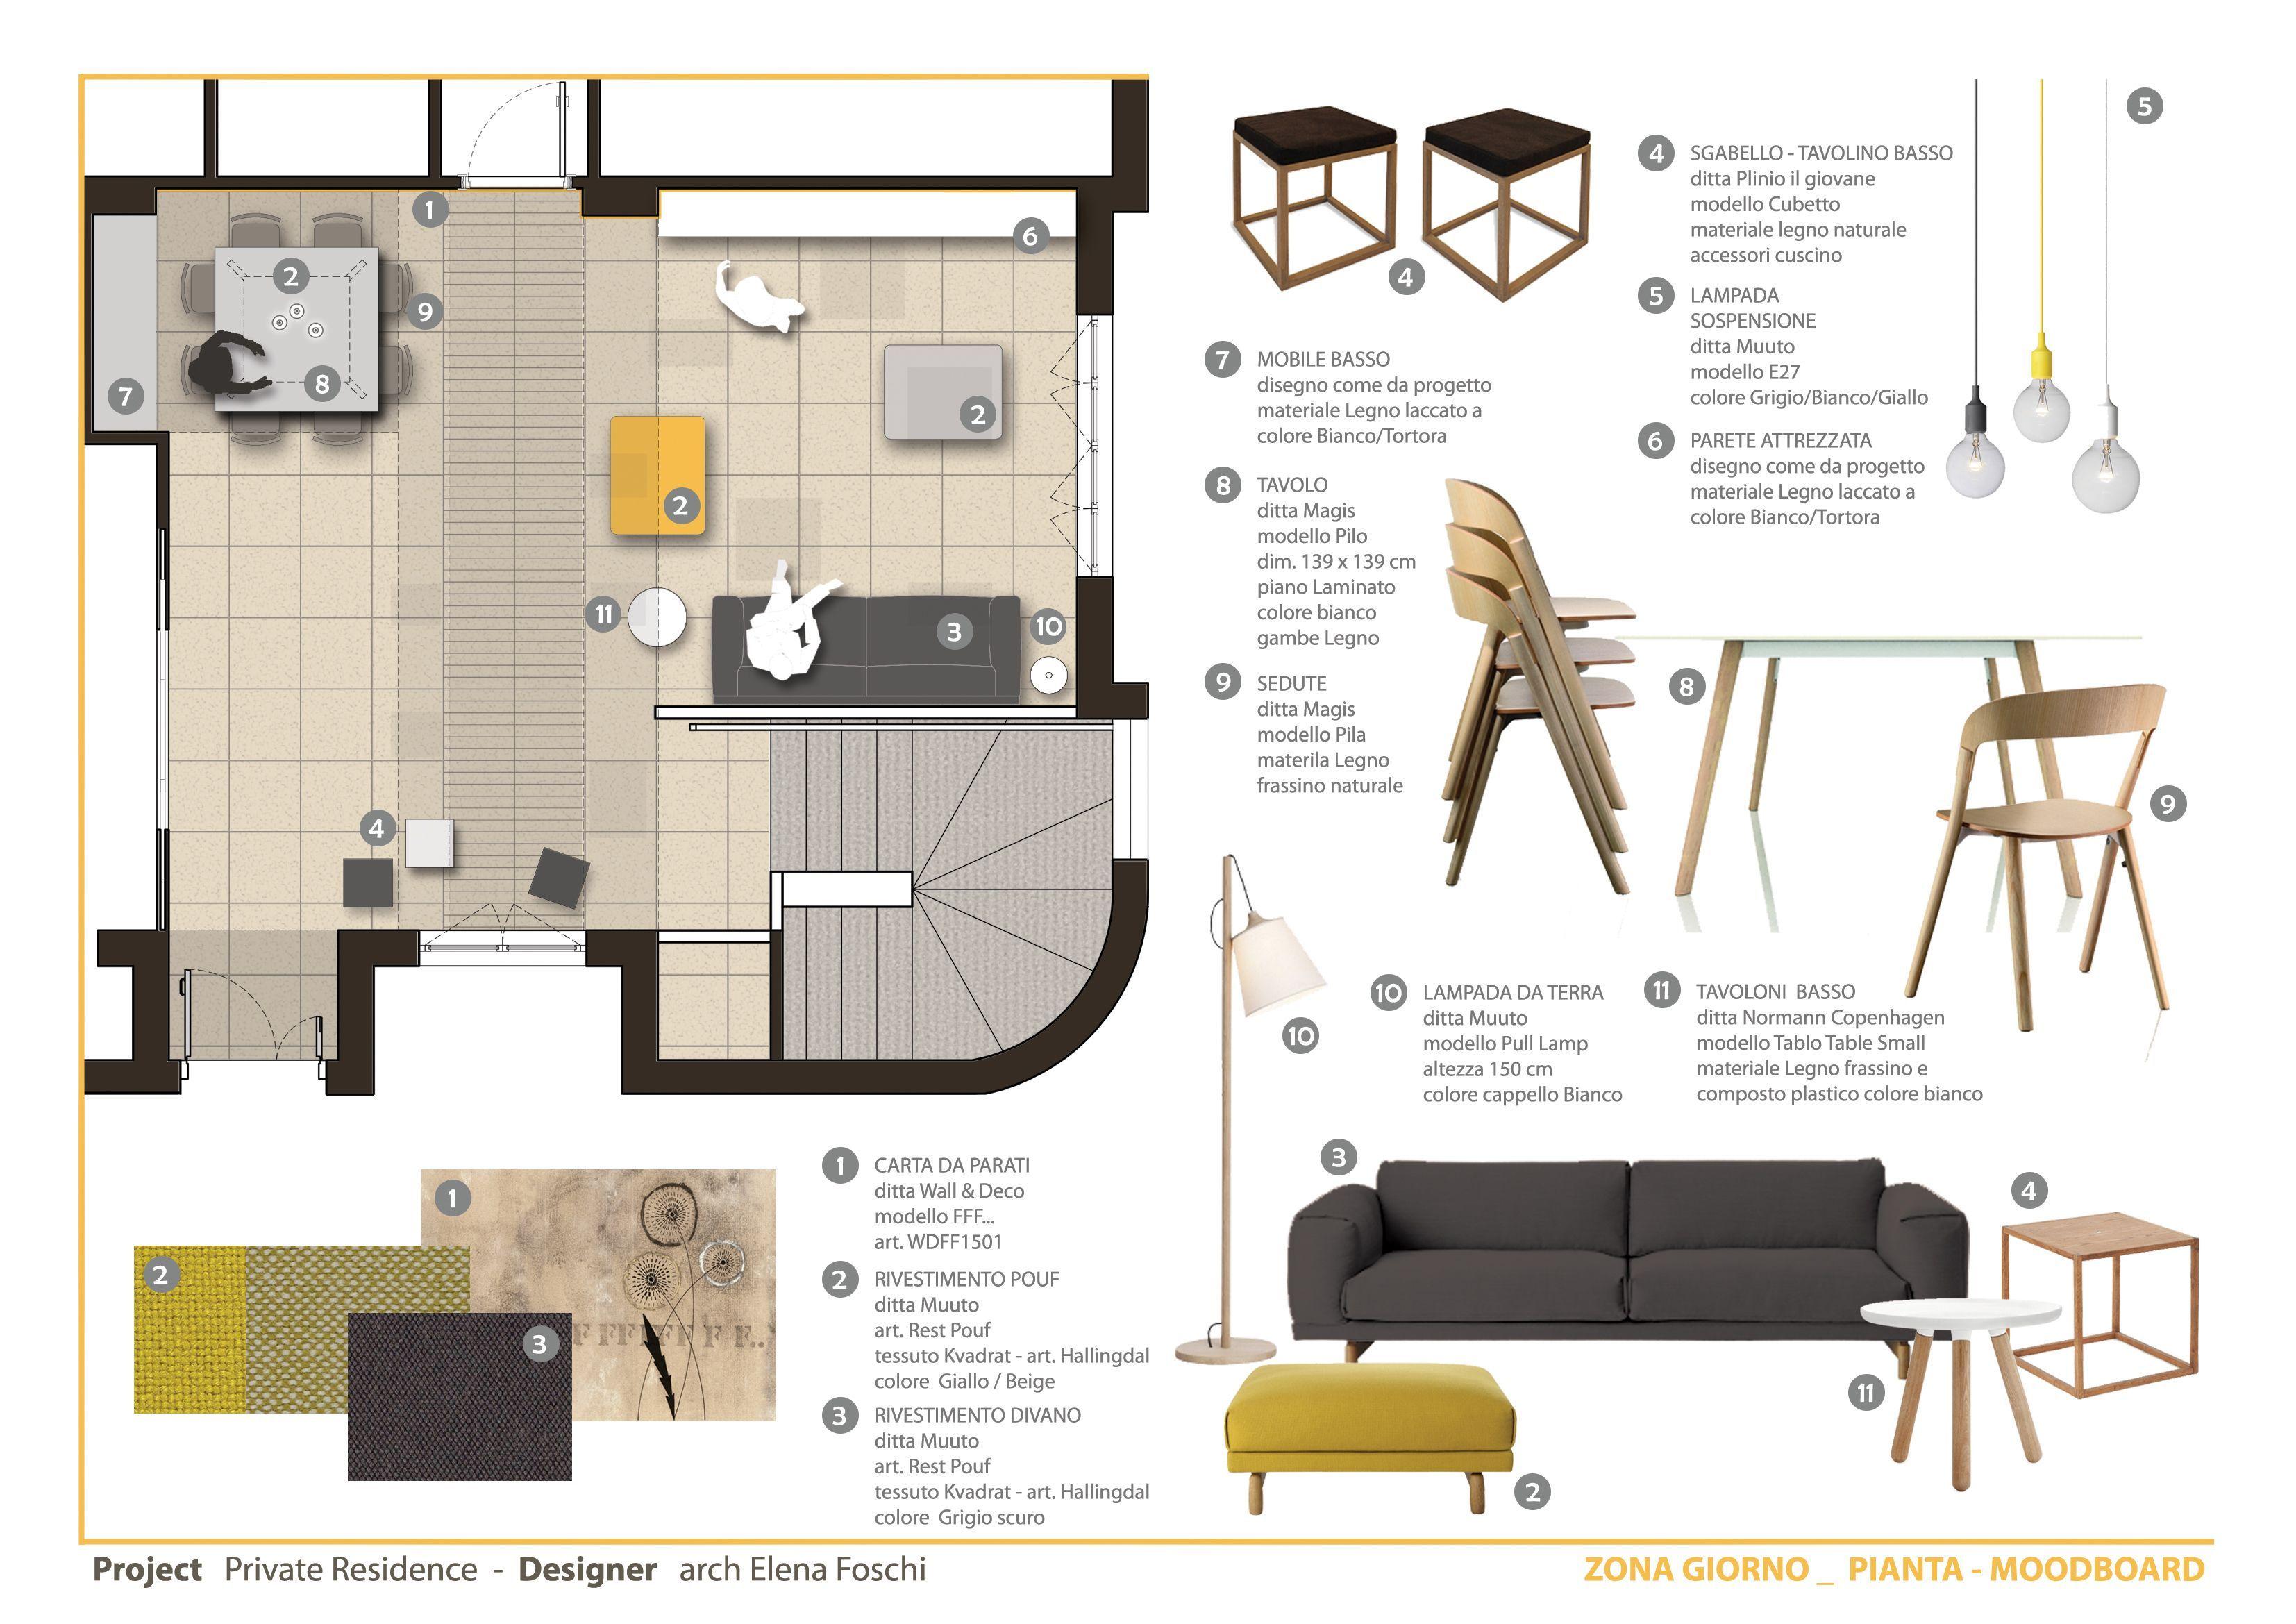 Moodboard Private Residence In 2020 Interior Design Mood Board Interior Design Portfolios Interior Design Boards